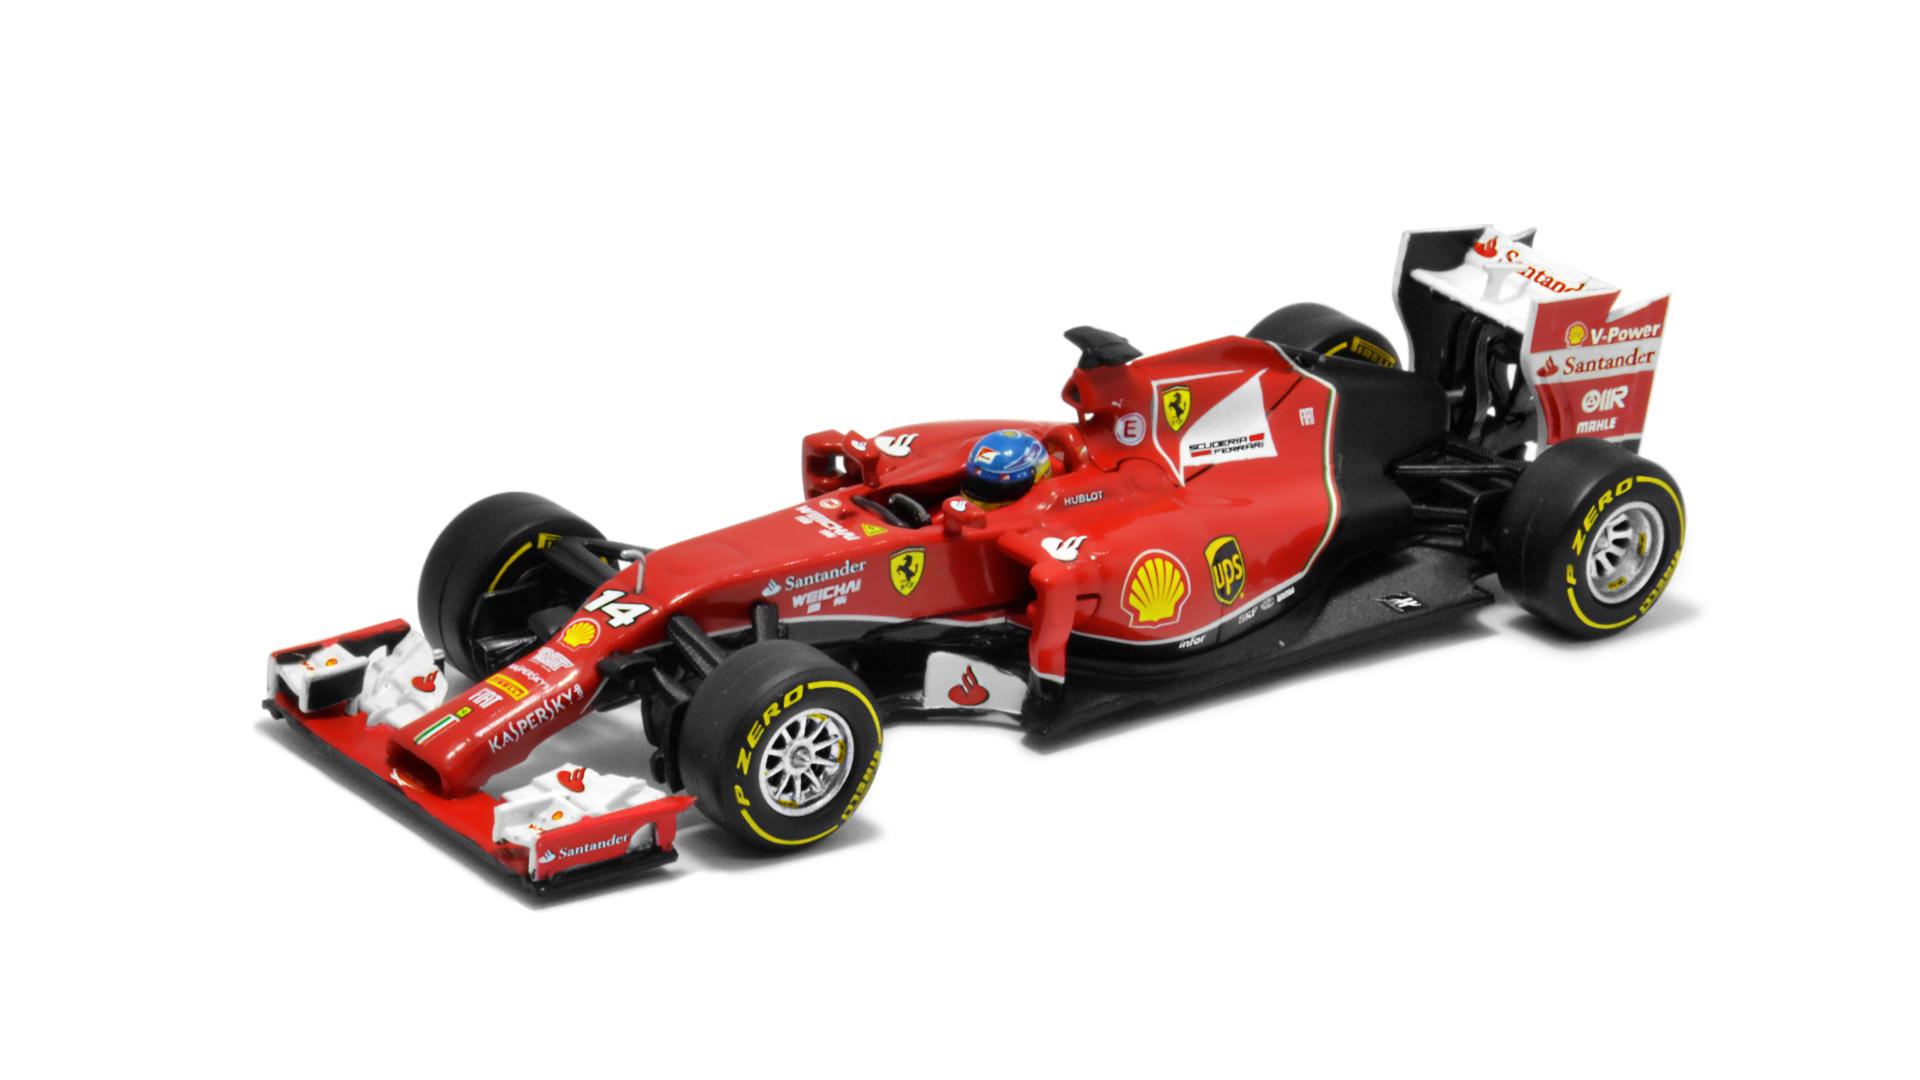 Év: 2014<br />Modell: F14T<br />Gyártó: Hot Wheels<br />Pilóta: Fernando Alonso